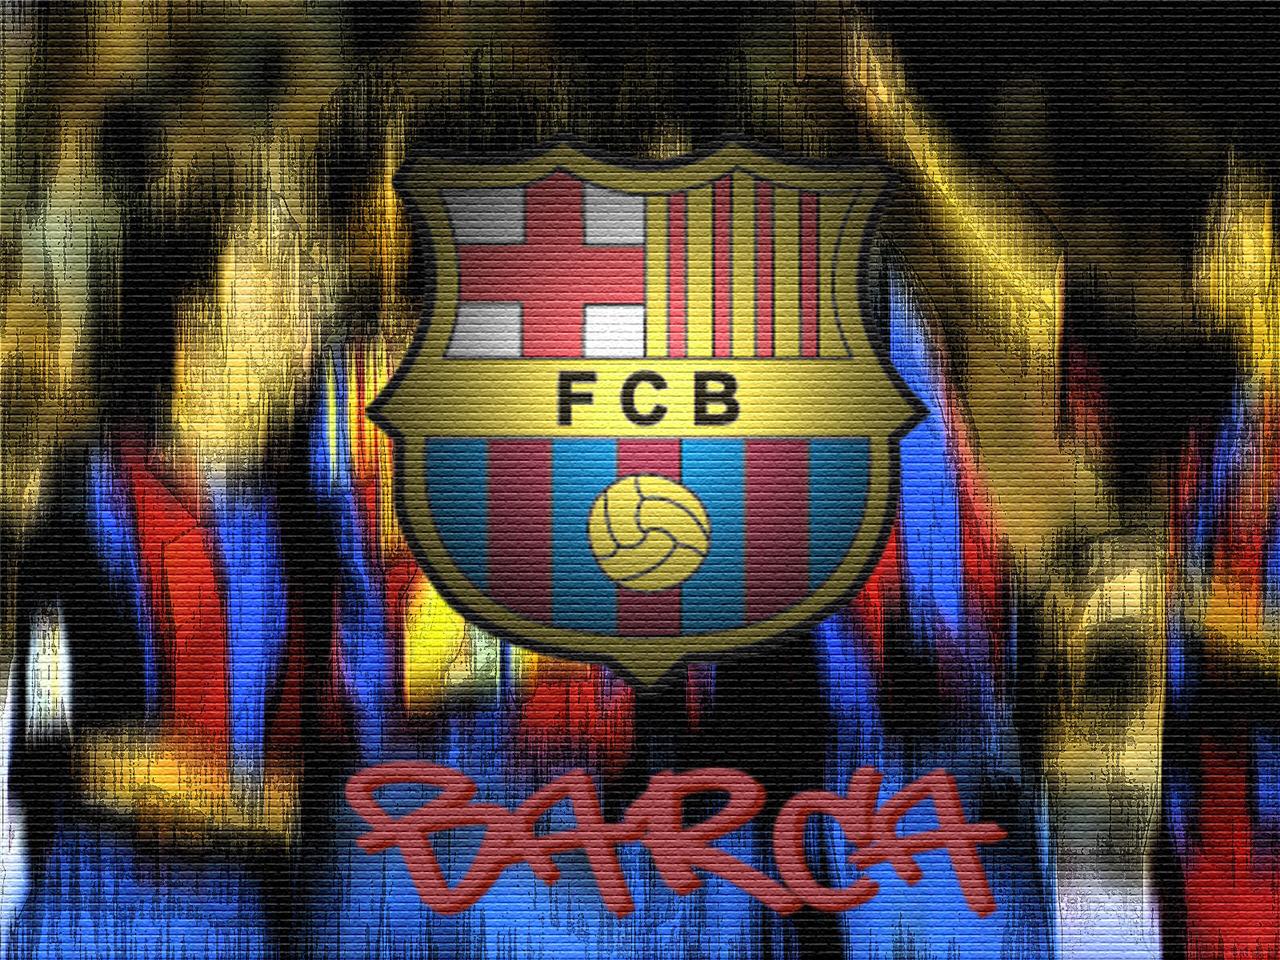 Vs Girl Wallpaper Lionel Messi Messi And Barca